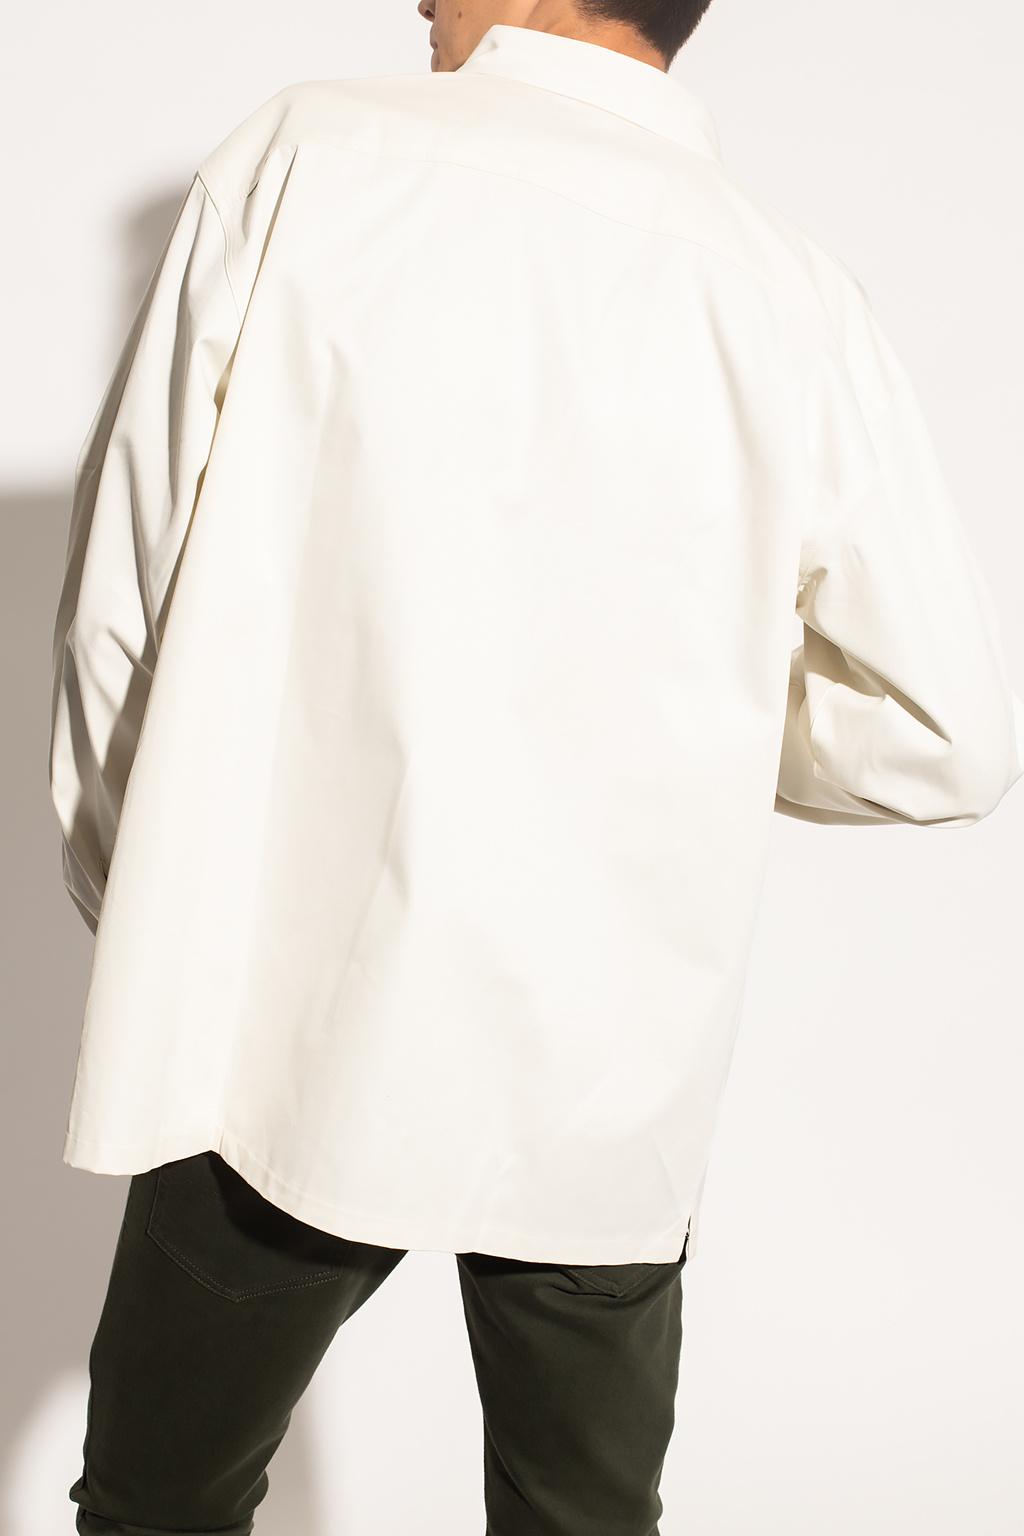 Diesel Overshirt with pocket